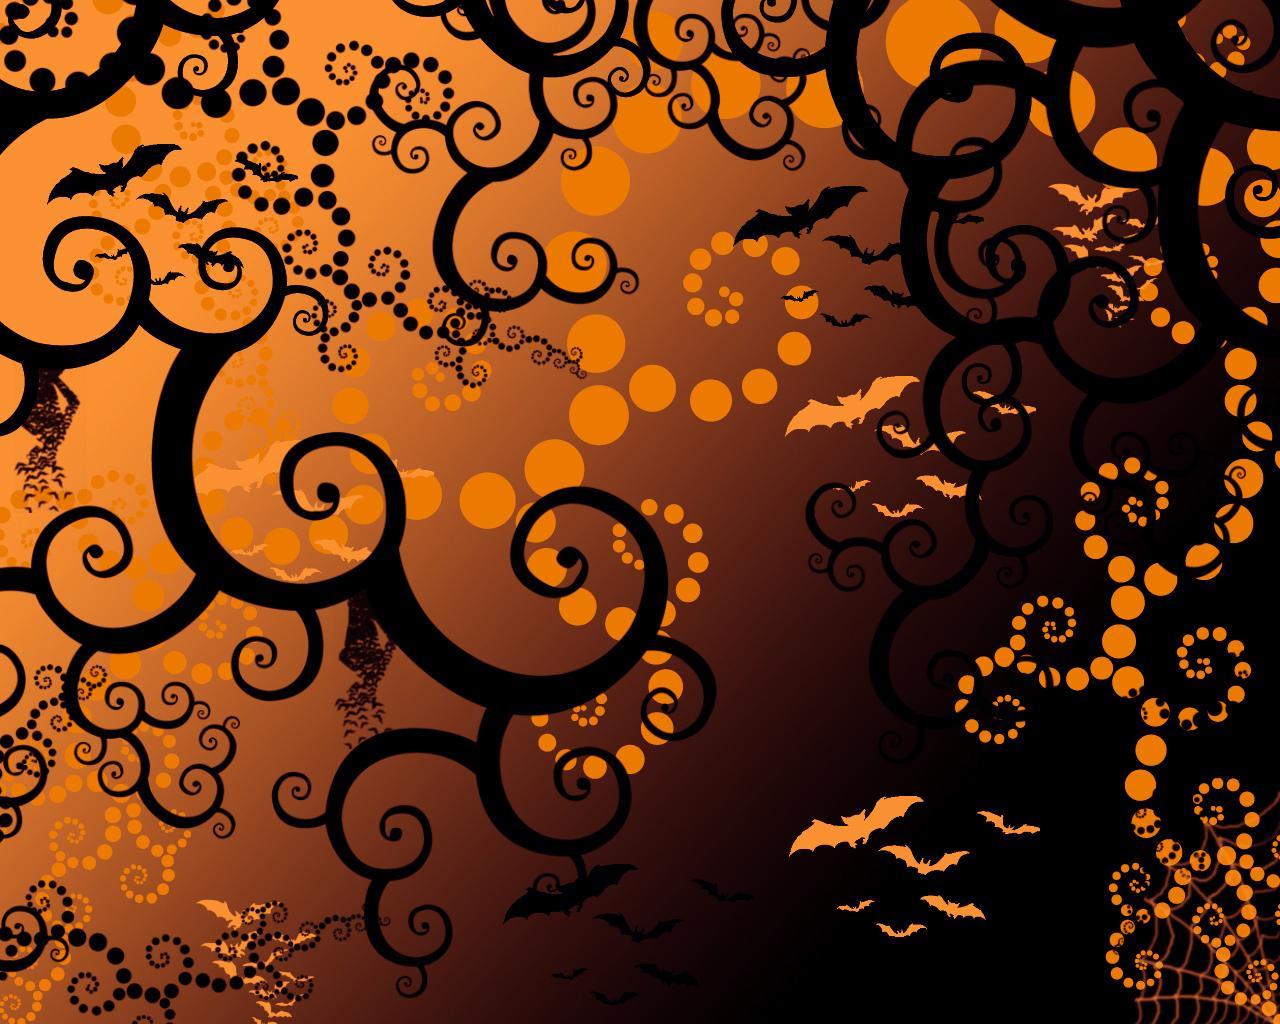 Halloween By GreenKiwiOfDoom Slides PPT Backgrounds